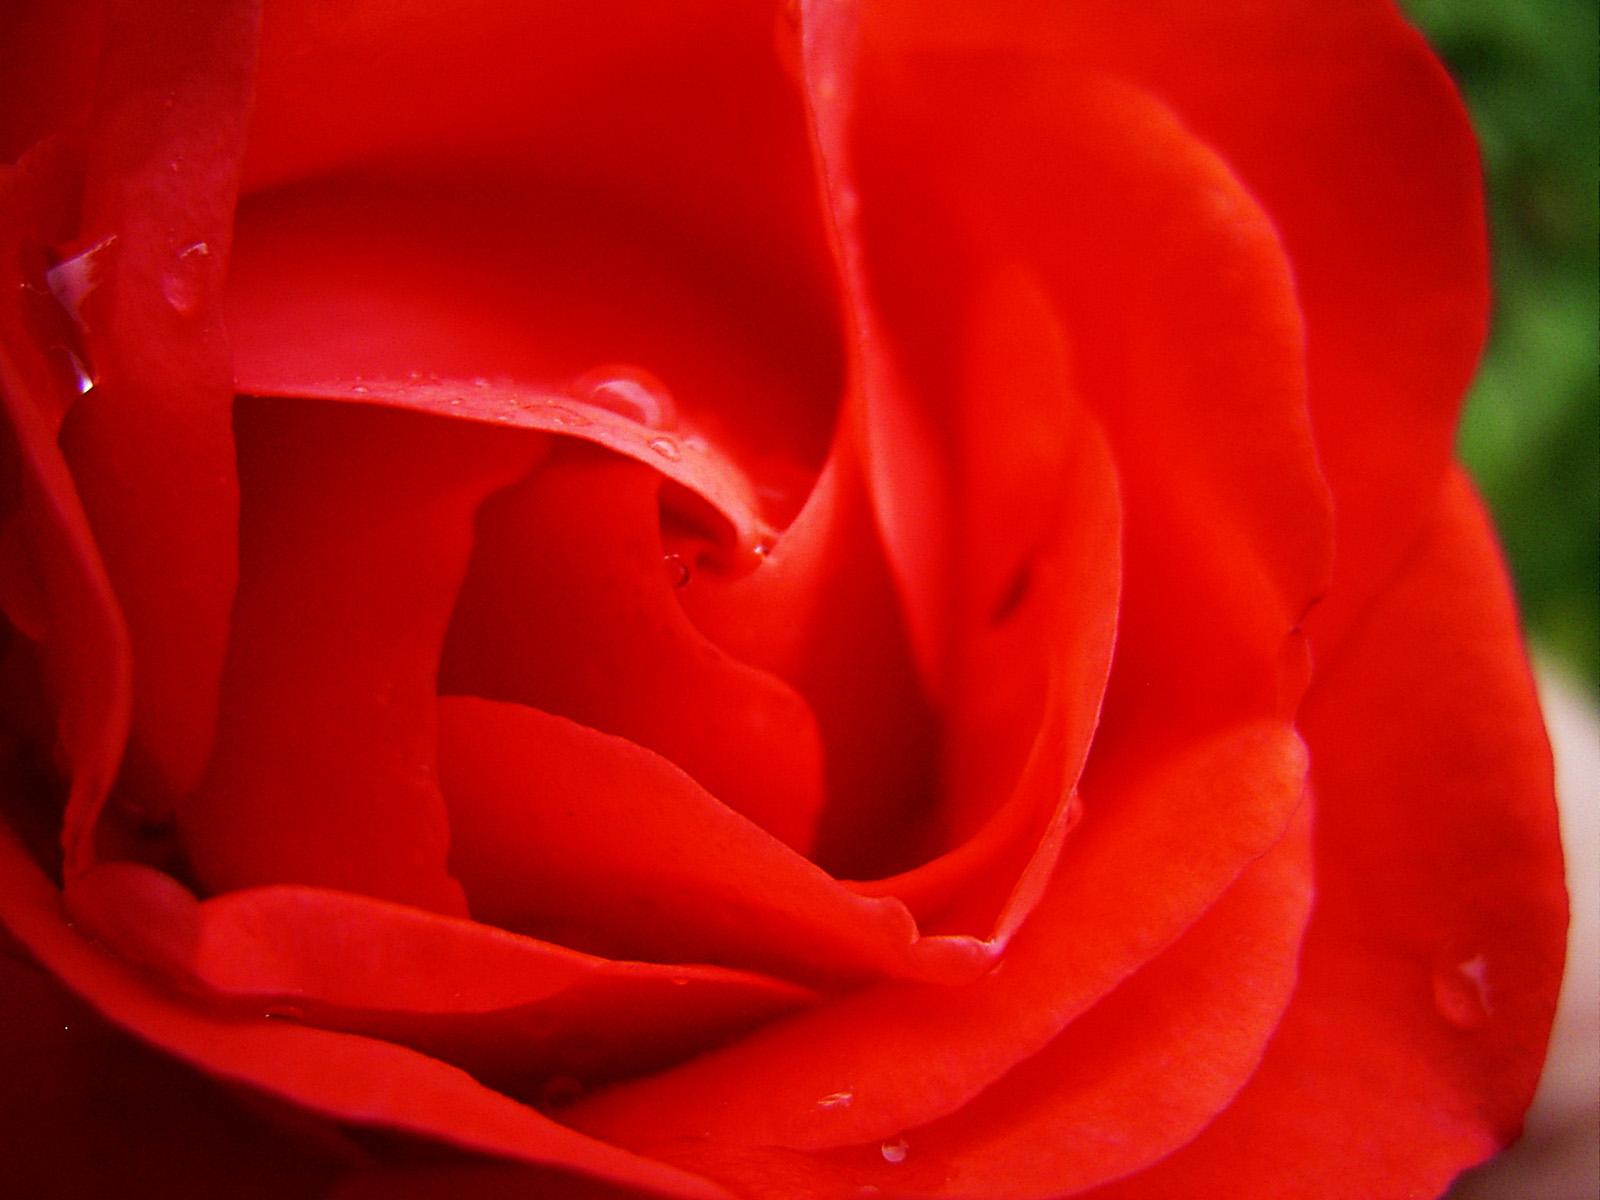 http://3.bp.blogspot.com/-KwgxssOtLkM/TnUcw8BbdcI/AAAAAAAABdo/MSBMd3sf8Kw/s1600/natural+flowers+wallpaper+2.jpg